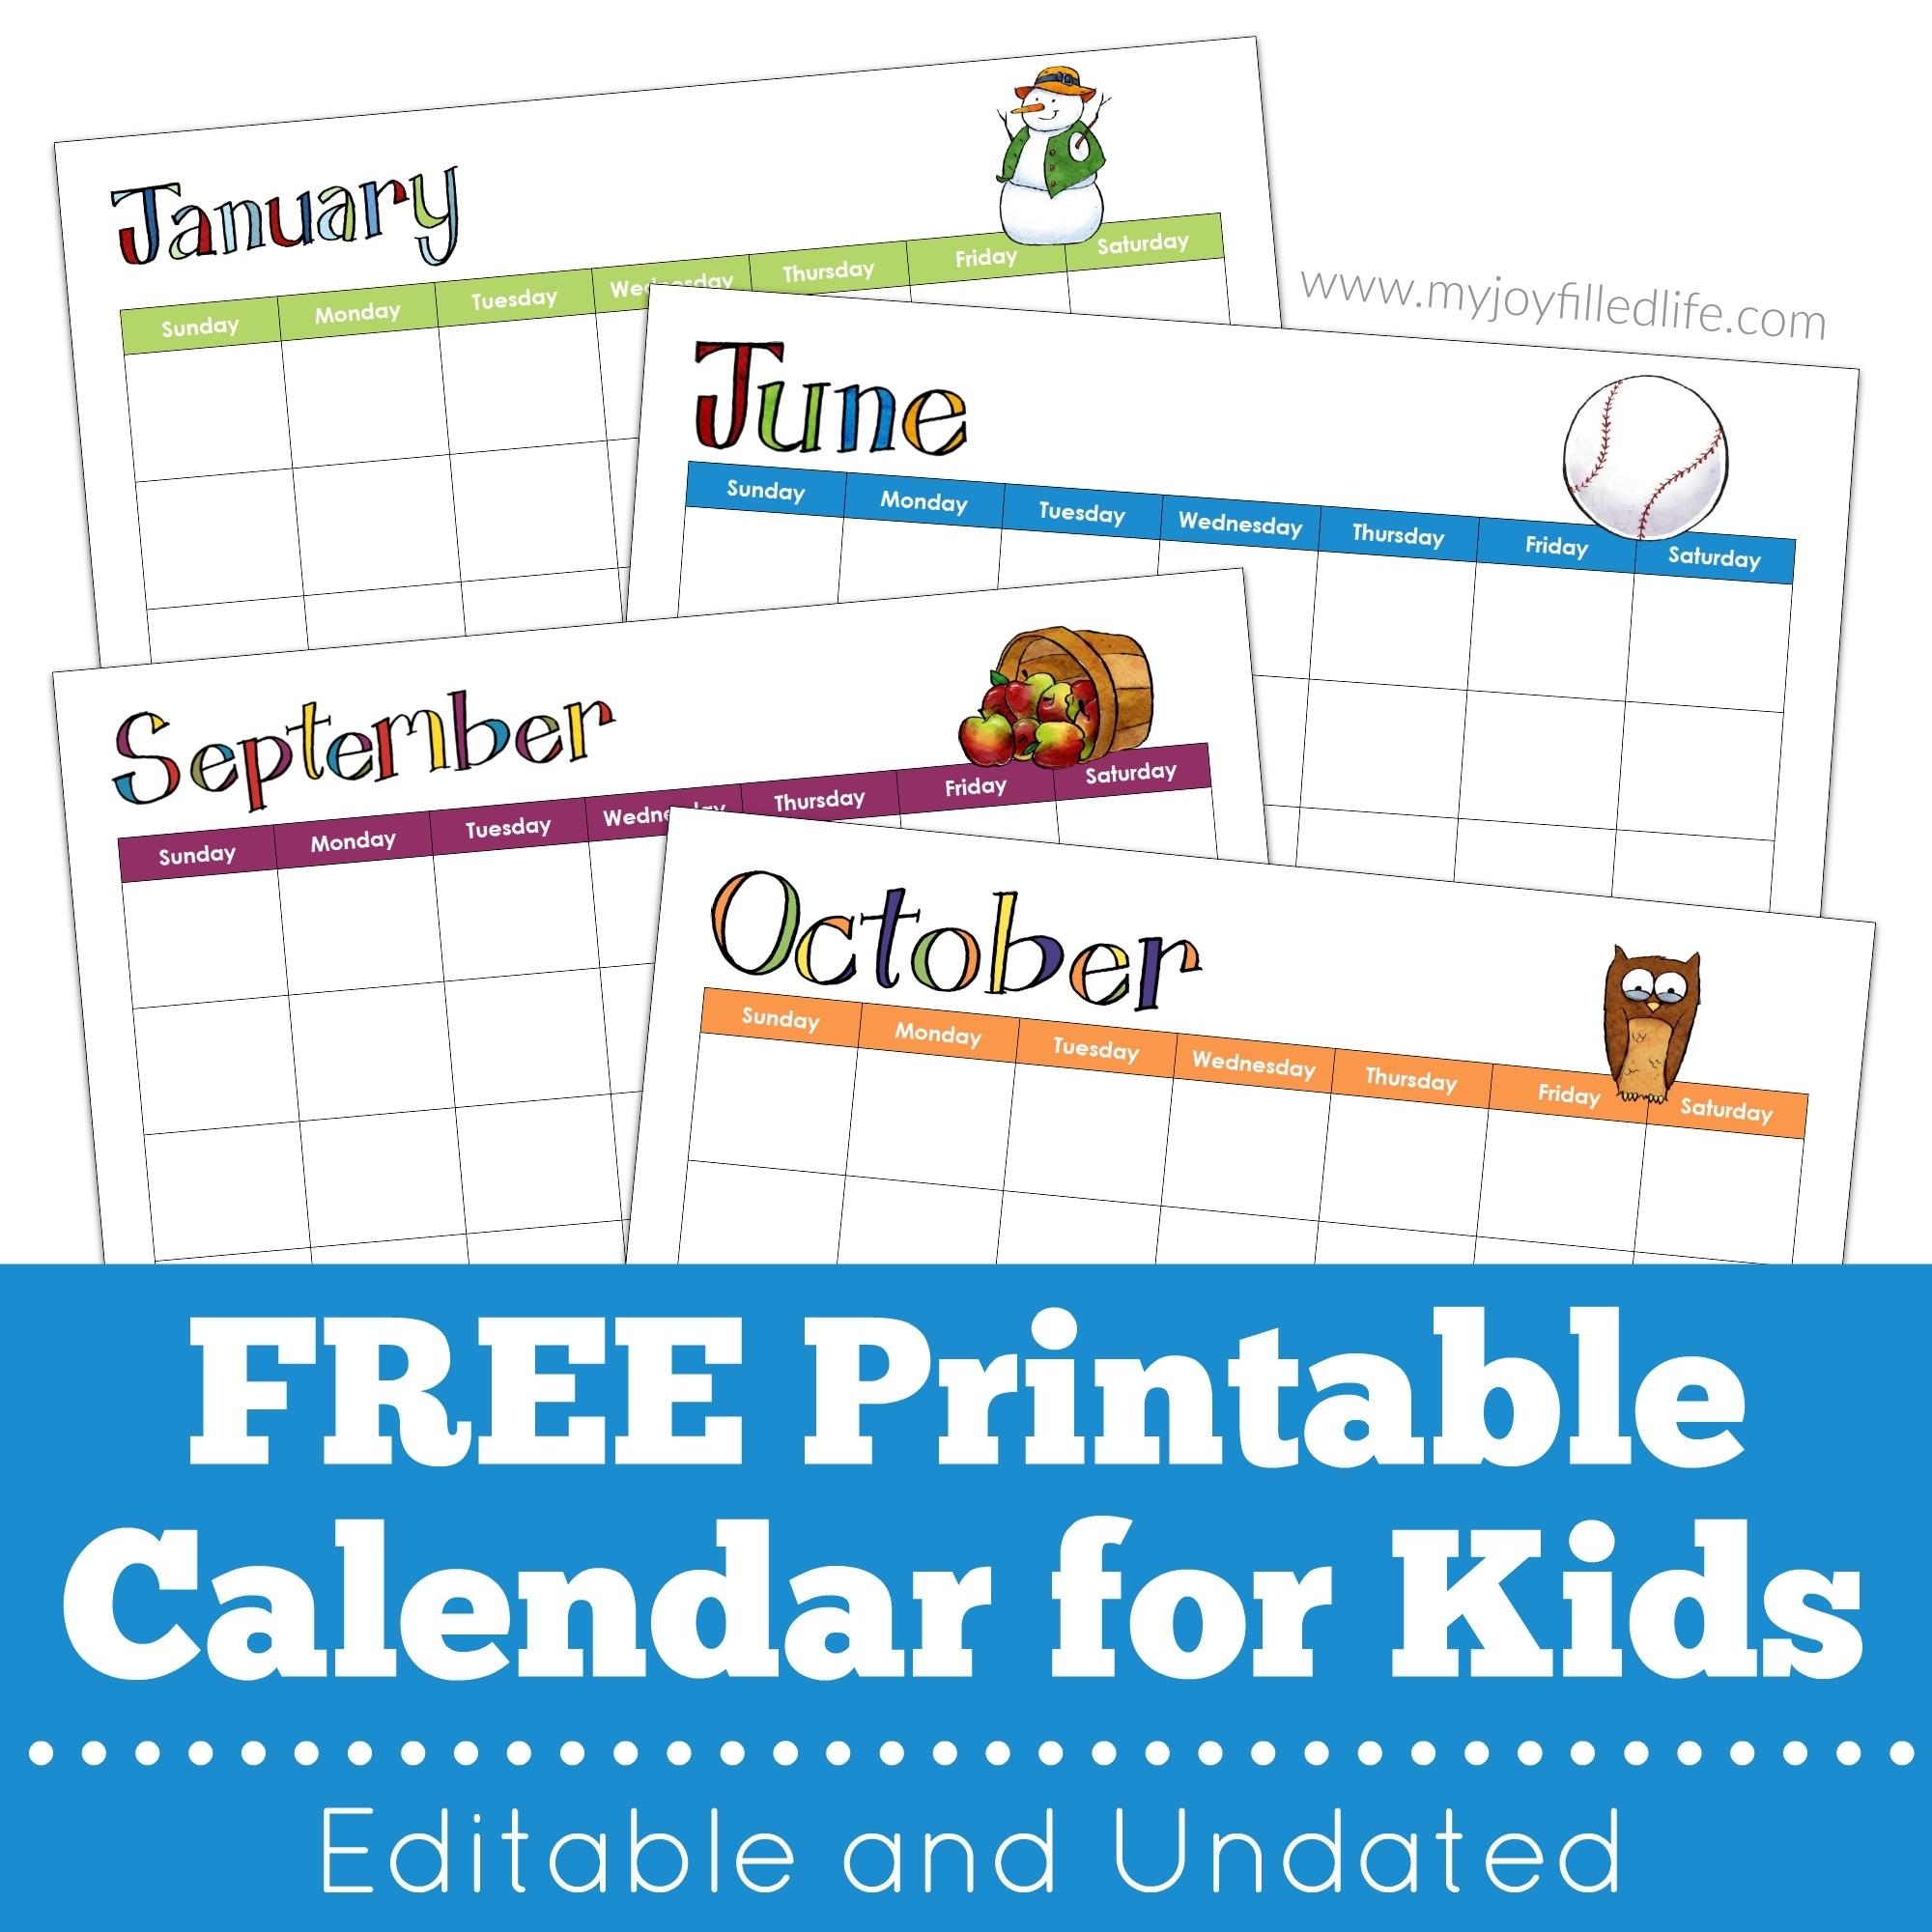 Printable Calendar - Editable & Undated - My Joy-Filled Life in Undated Printable Monthly Calendar Free